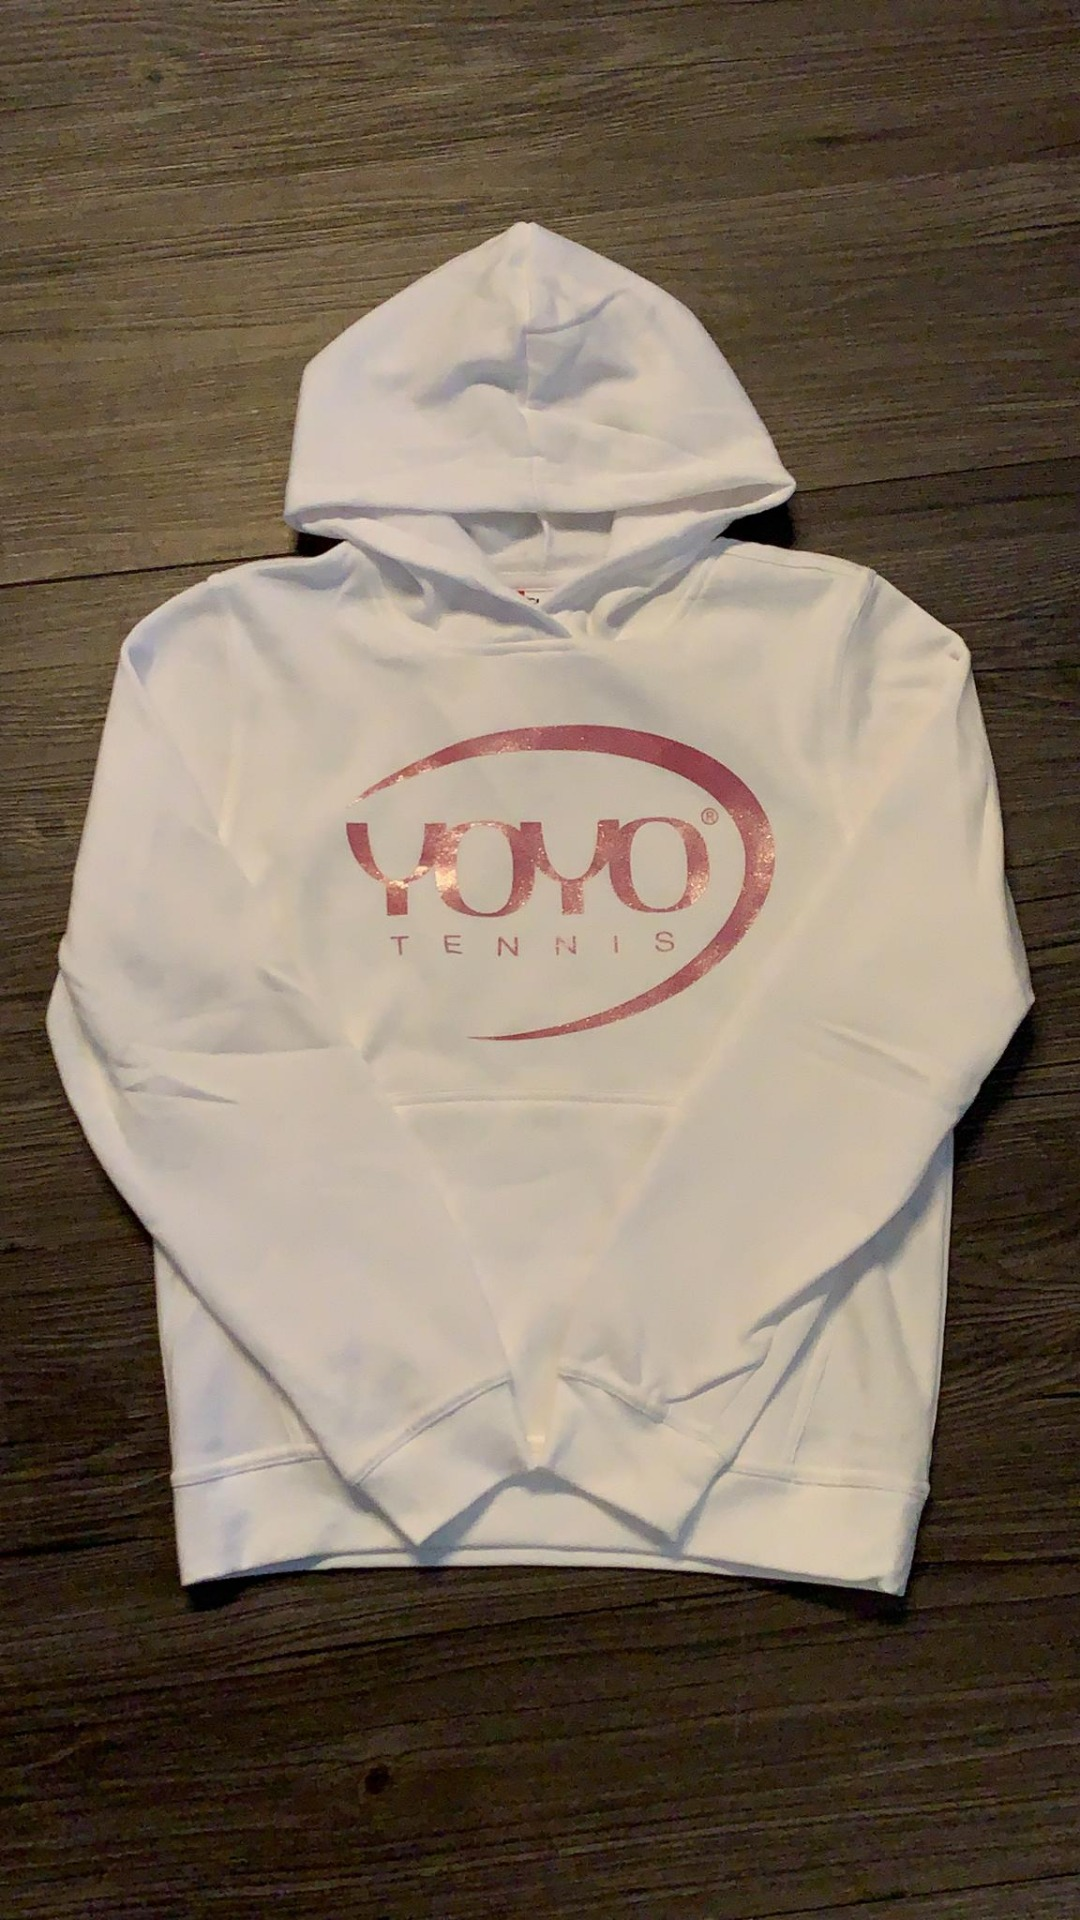 YOYO-TENNIS Hoody Bianco con Logo Rosa Brillantini Bambino